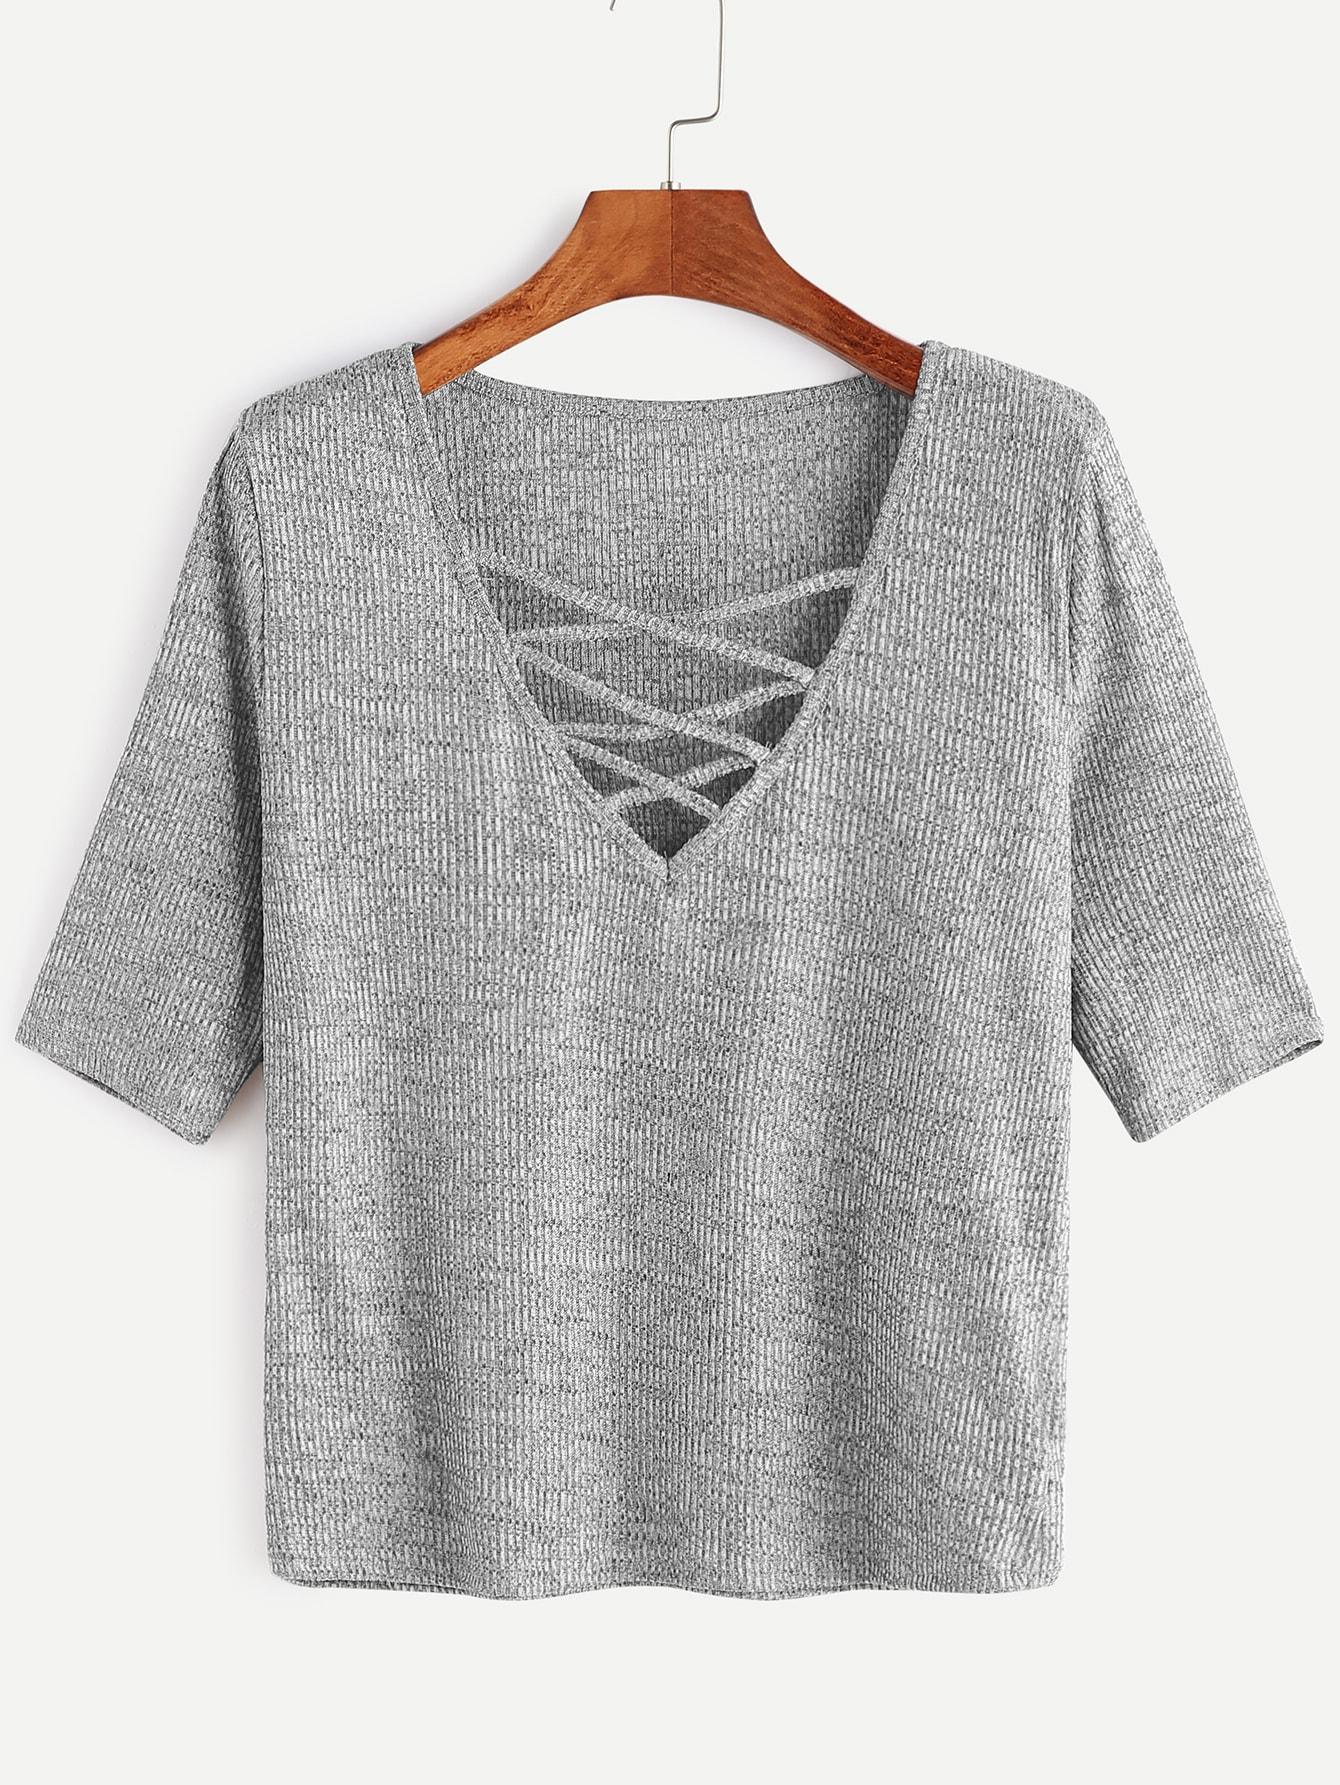 Grey Criss Cross Deep V Neck Ribbed Knit T-shirt